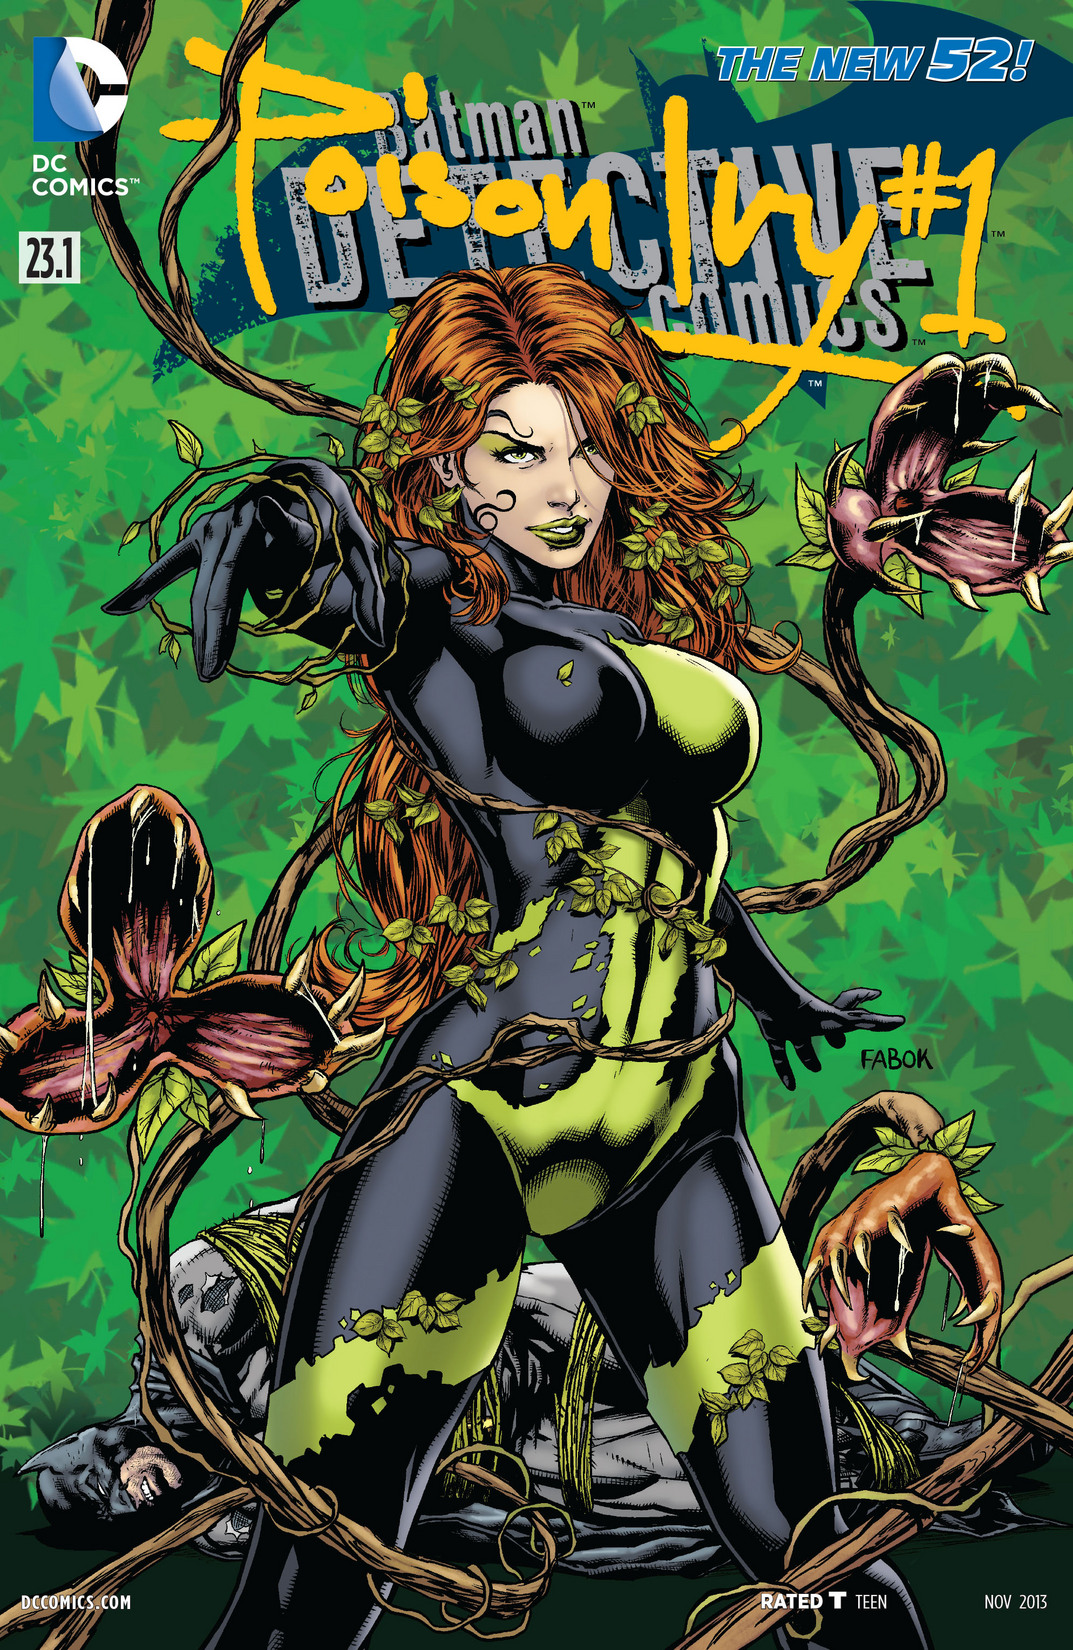 Ivy league dating dc comics